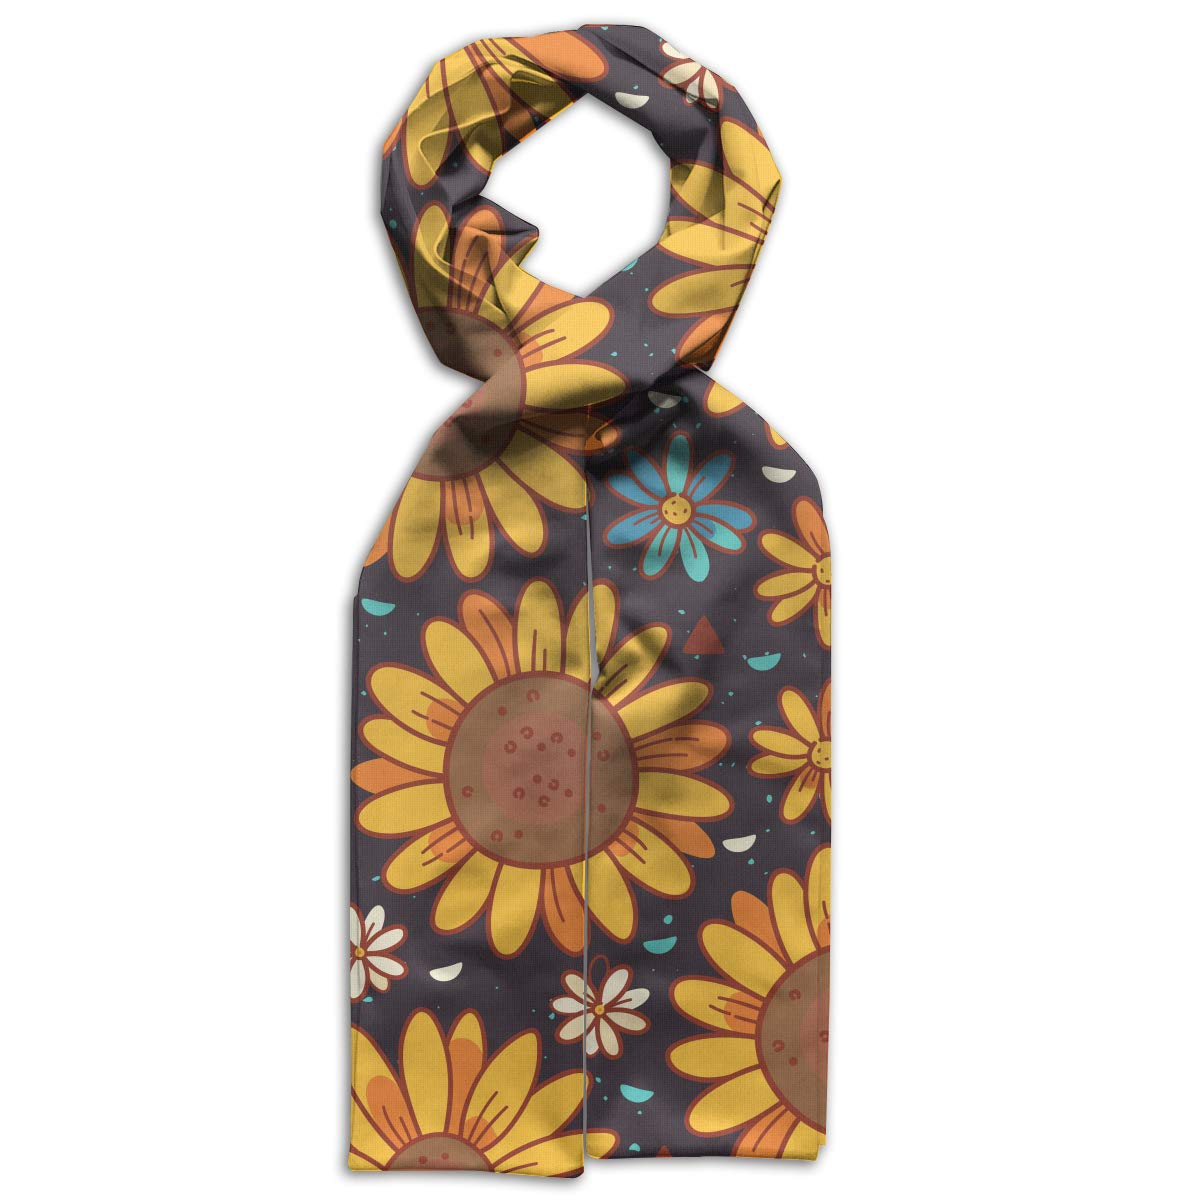 GQOP Kids Scarf Sunflowers Lightweight Long Scarf Shawl Warps